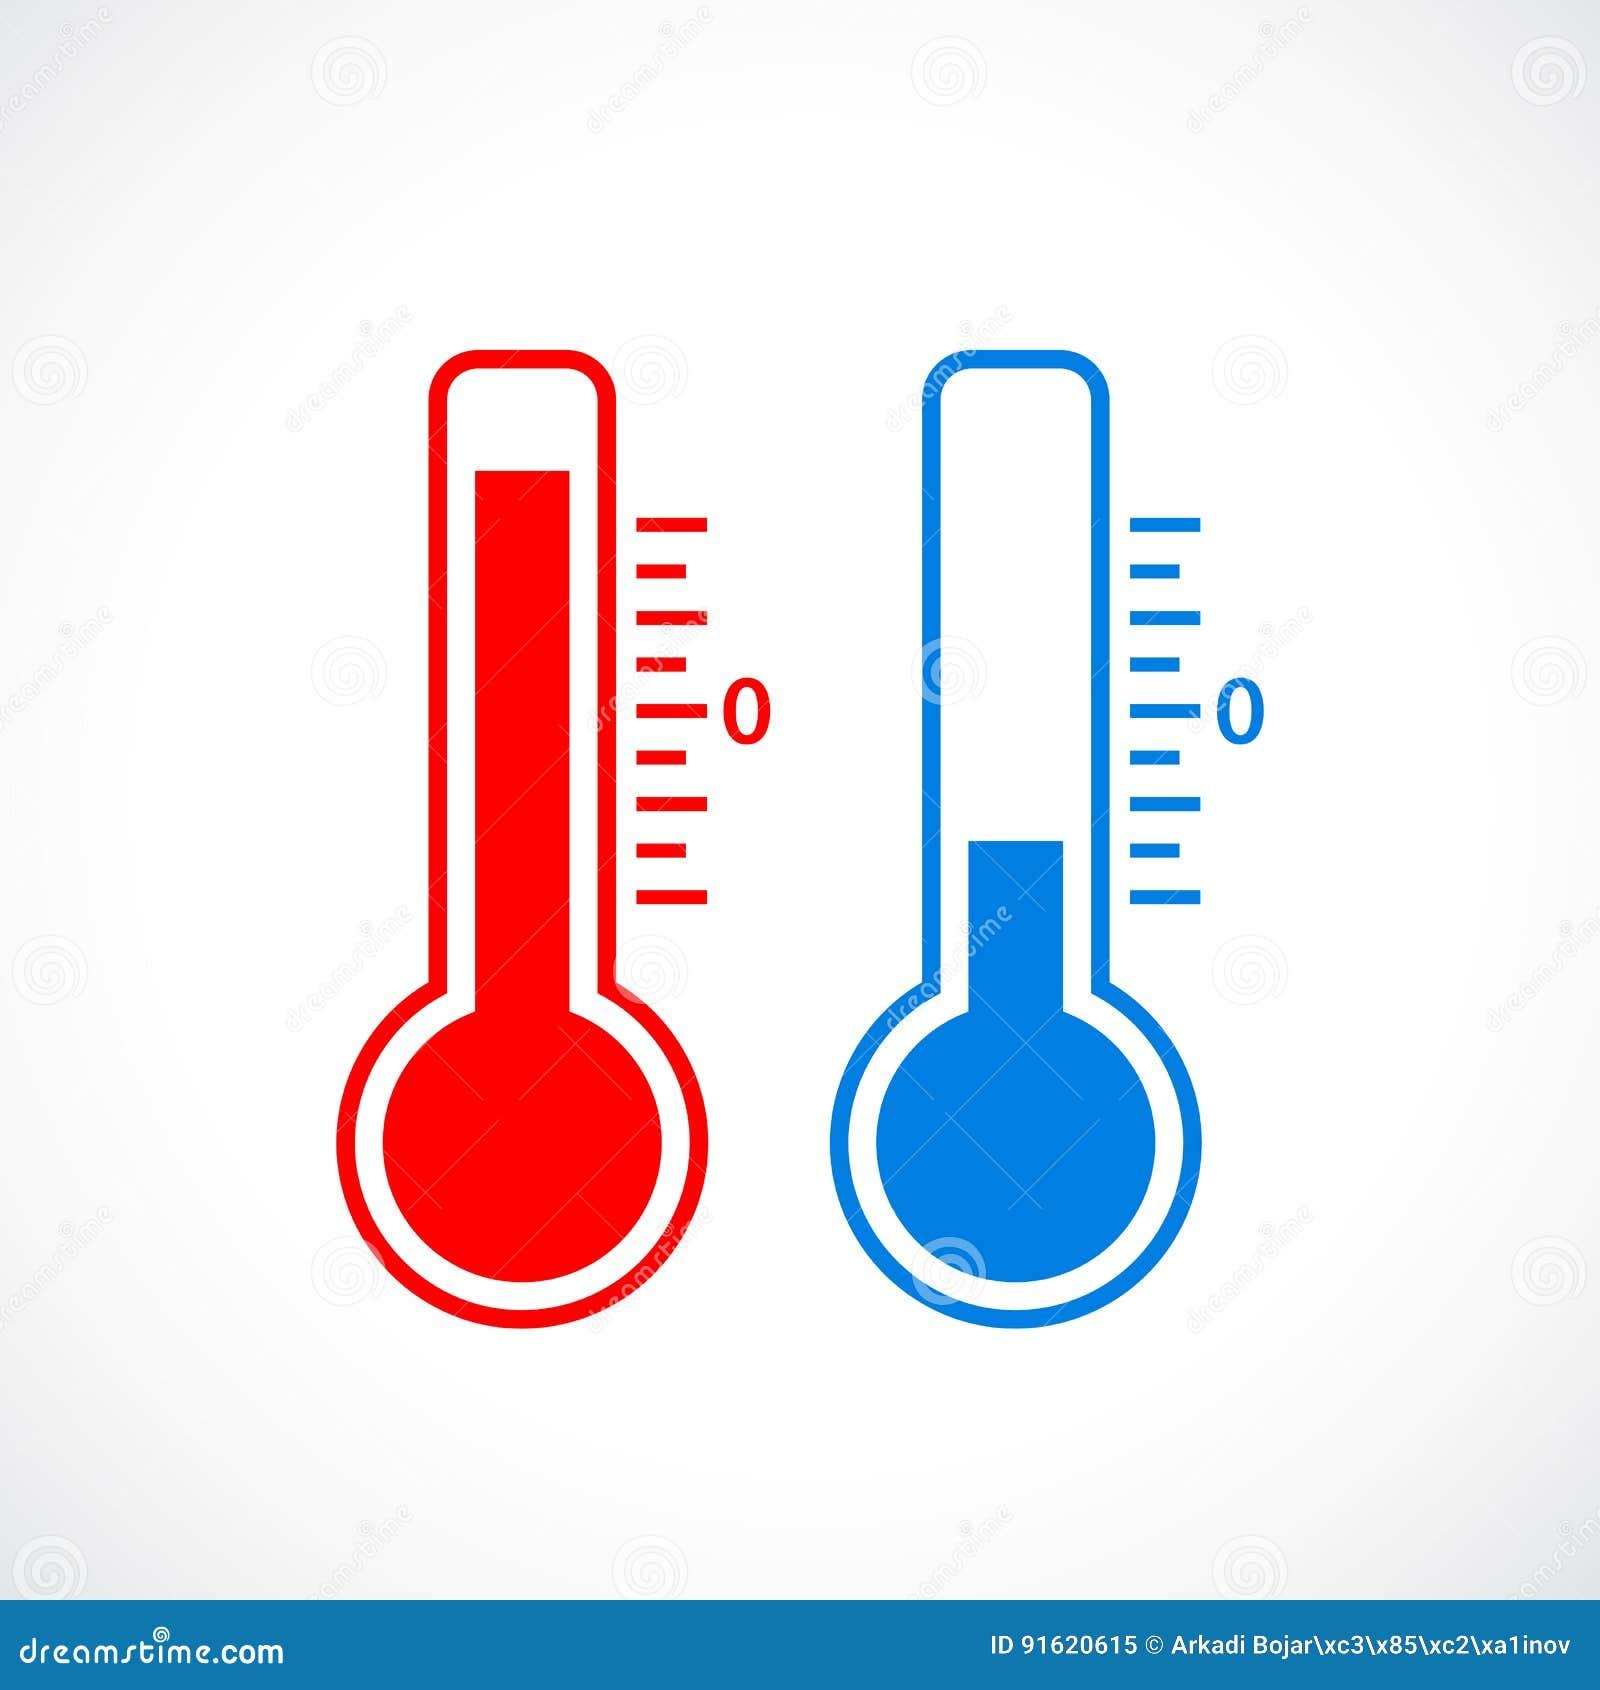 Icone Do Termometro Do Tempo Quente E Frio Ilustracao Do Vetor Ilustracao De Termometro Frio 91620615 Un termómetro es un instrumento utilizado para medir la temperatura con un alto nivel de exactitud. dreamstime